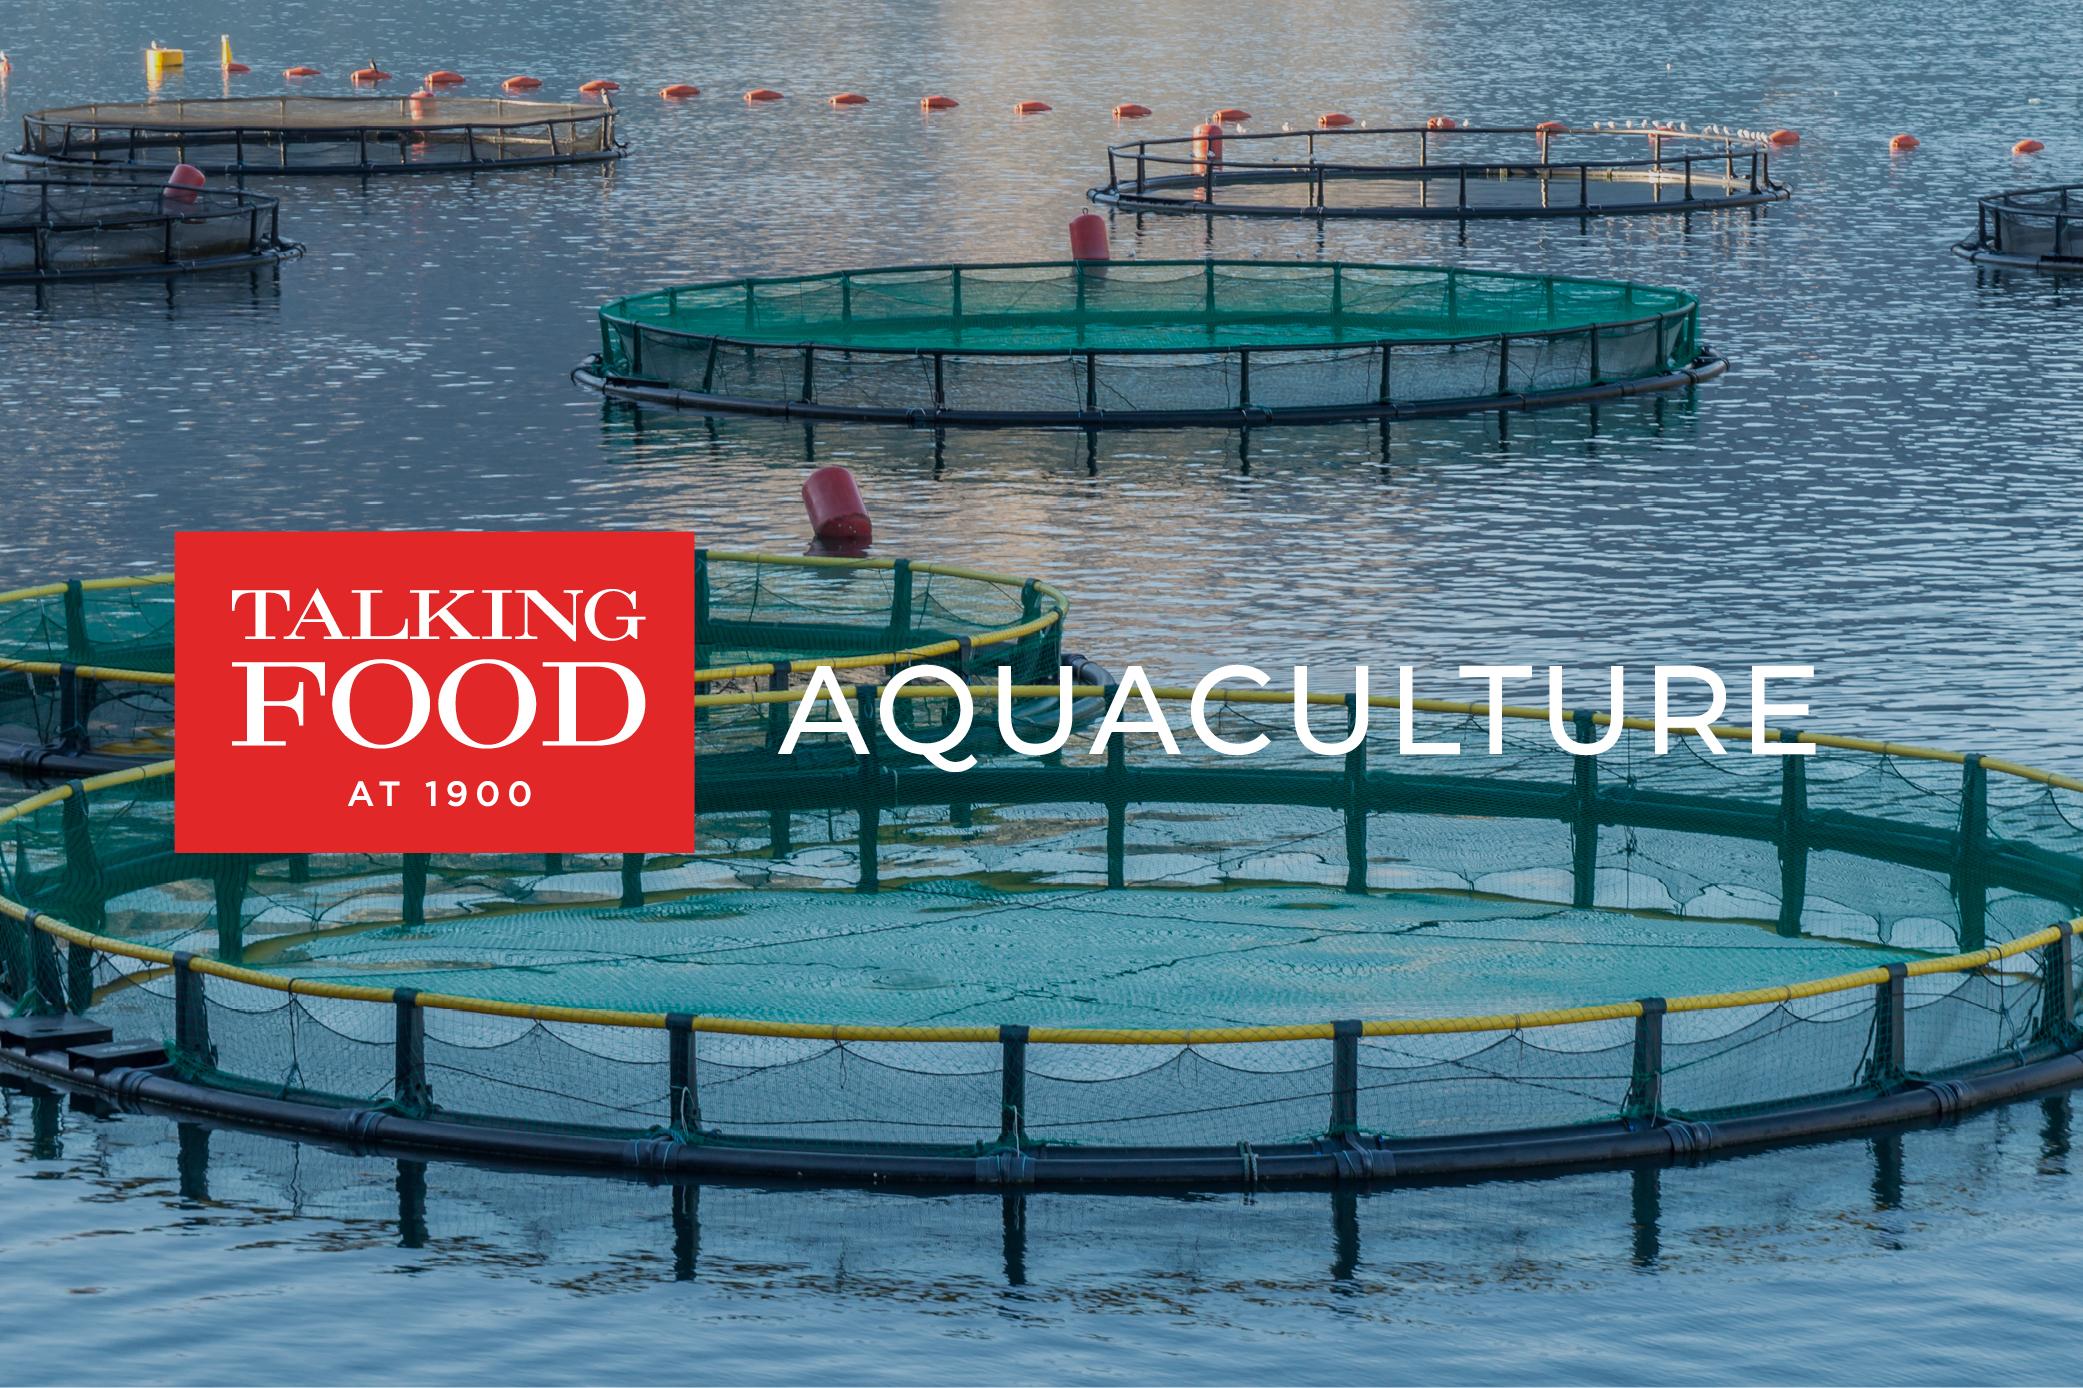 TalkingFood-Aquaculture.jpg